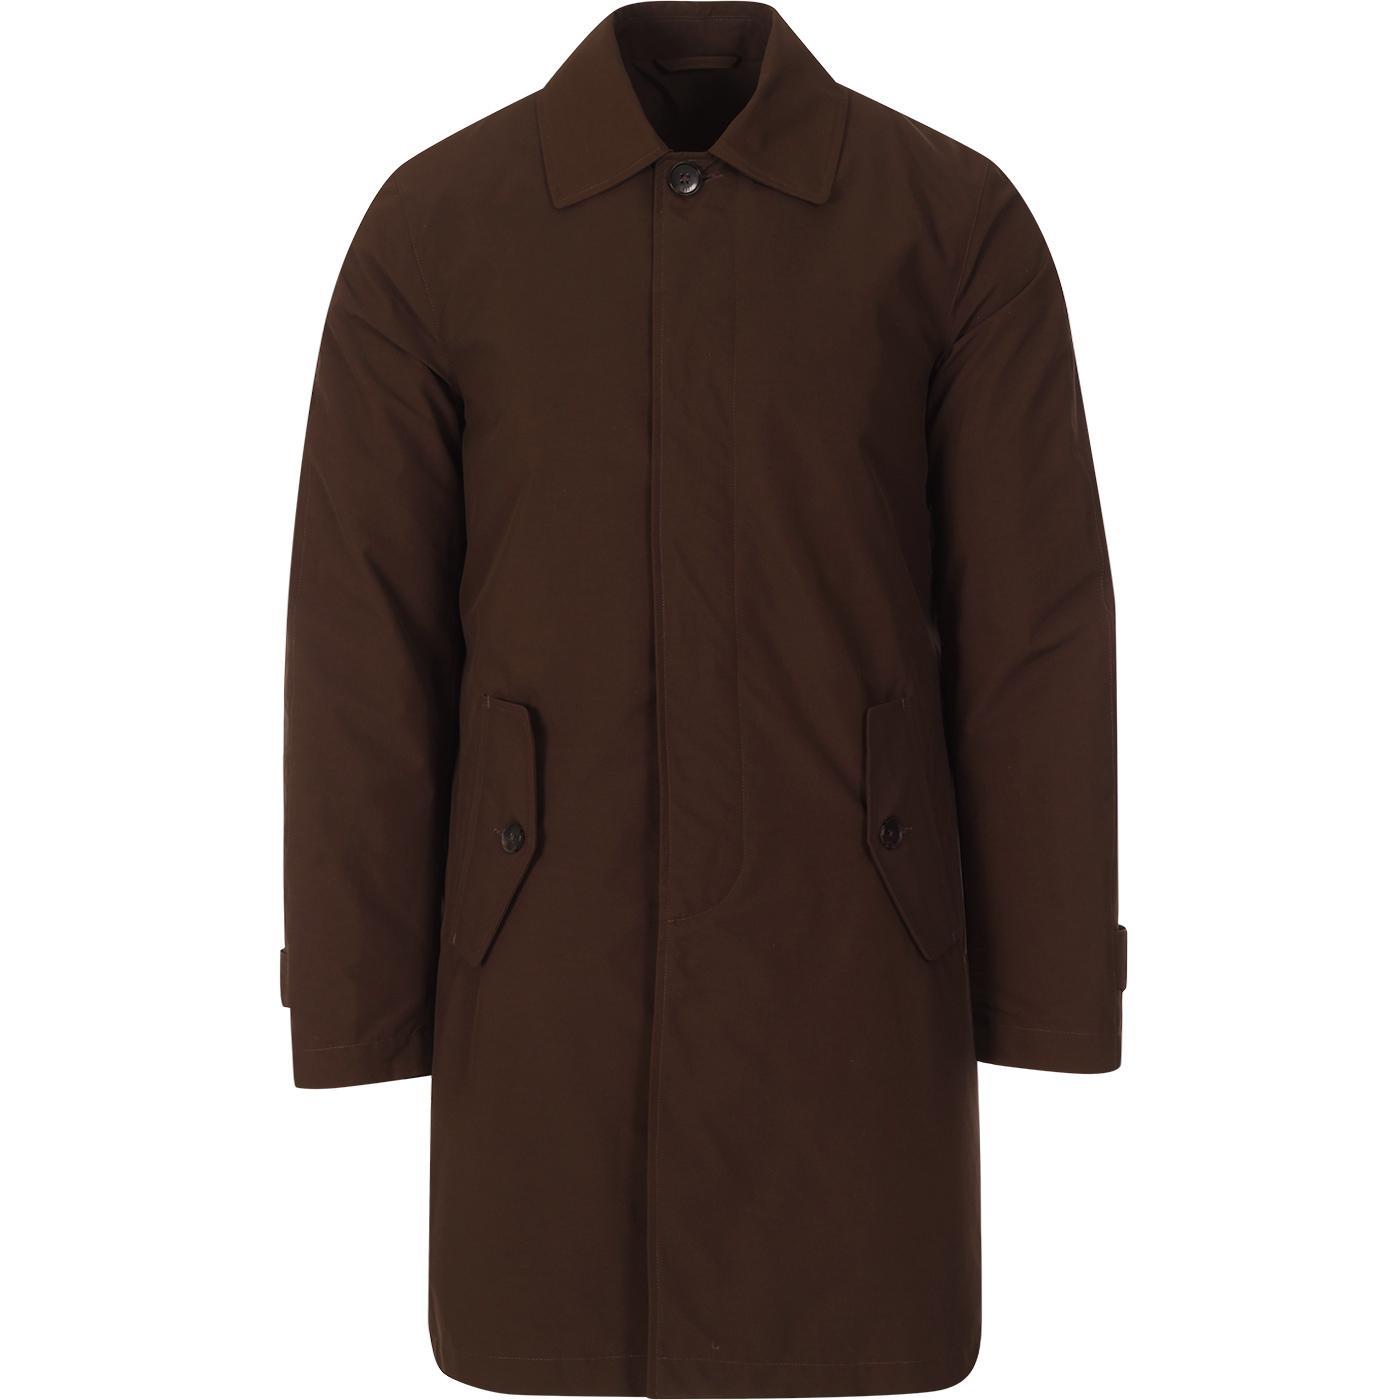 BARACUTA G10 Detachable Lining Raincoat CHOCOLATE